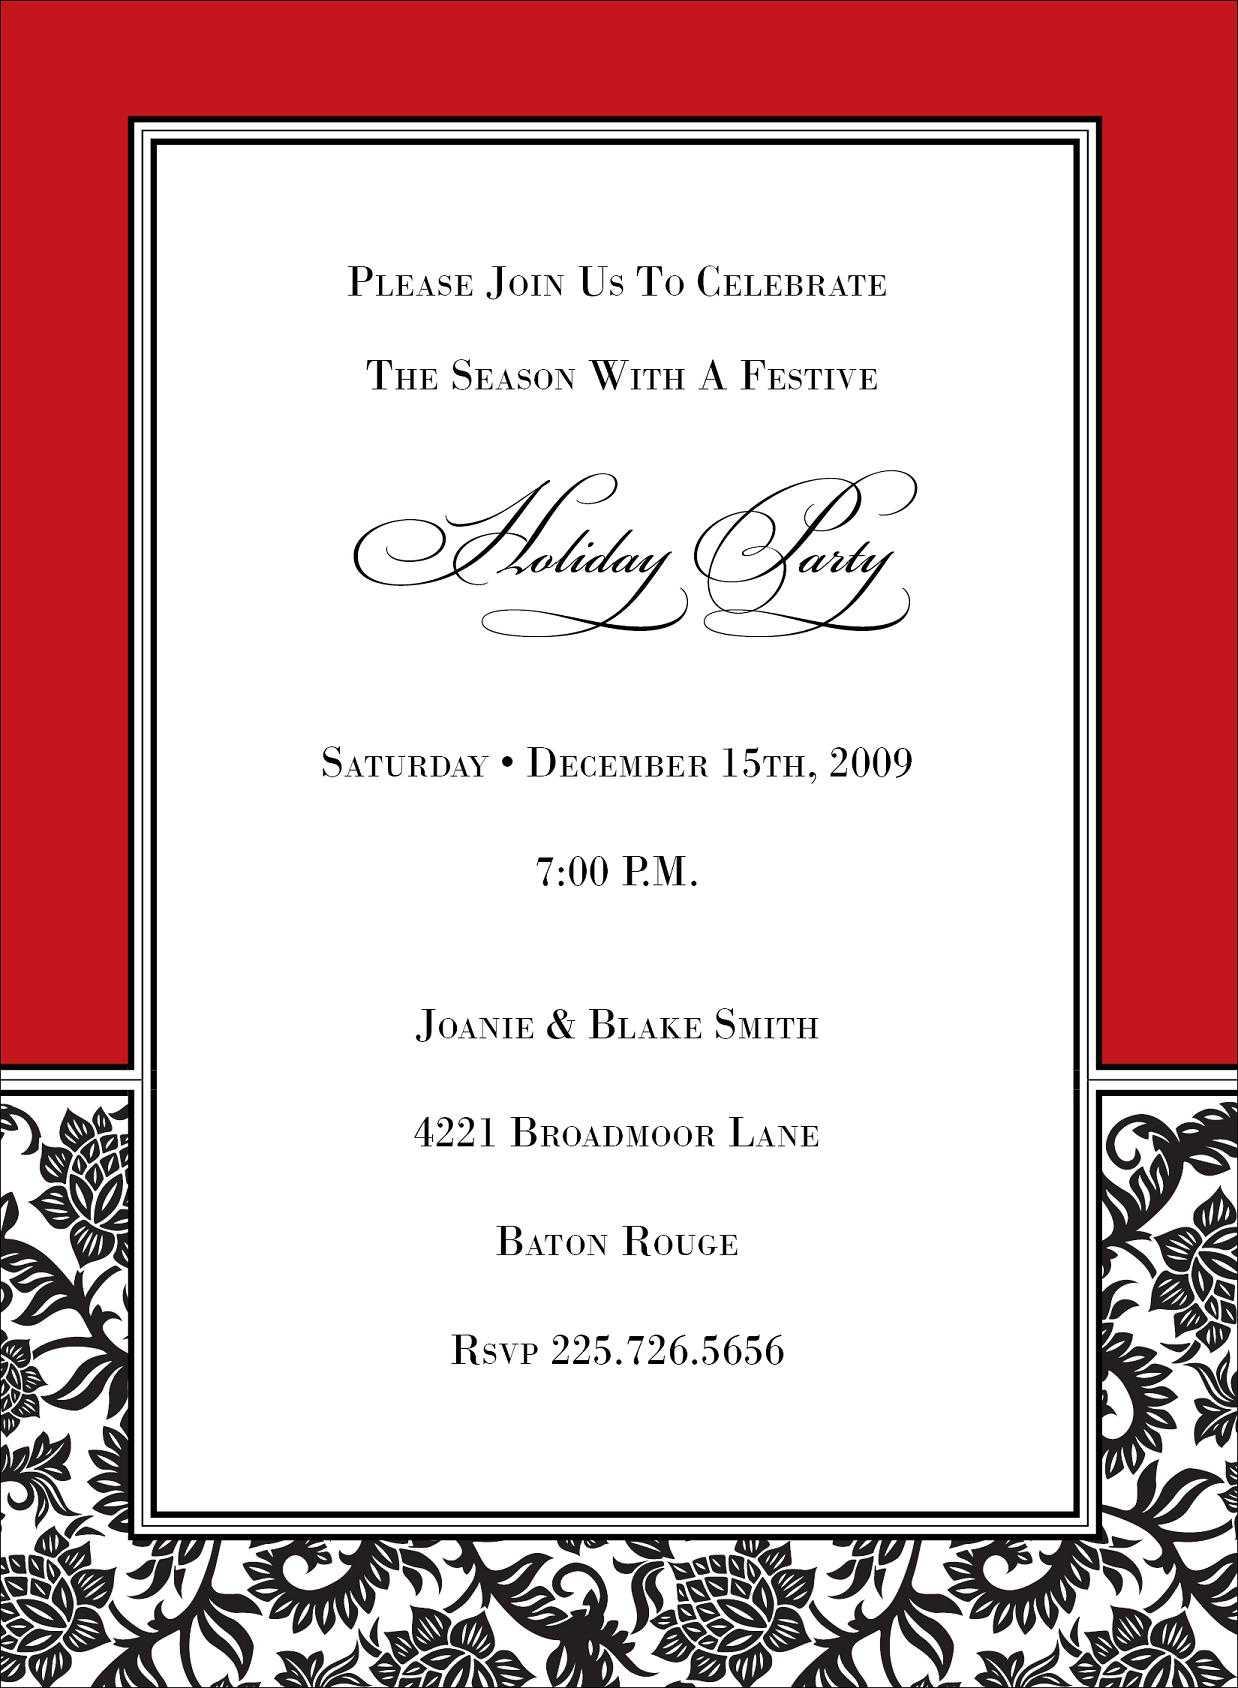 Christmas Potluck Invitation Ideas for nice invitations layout